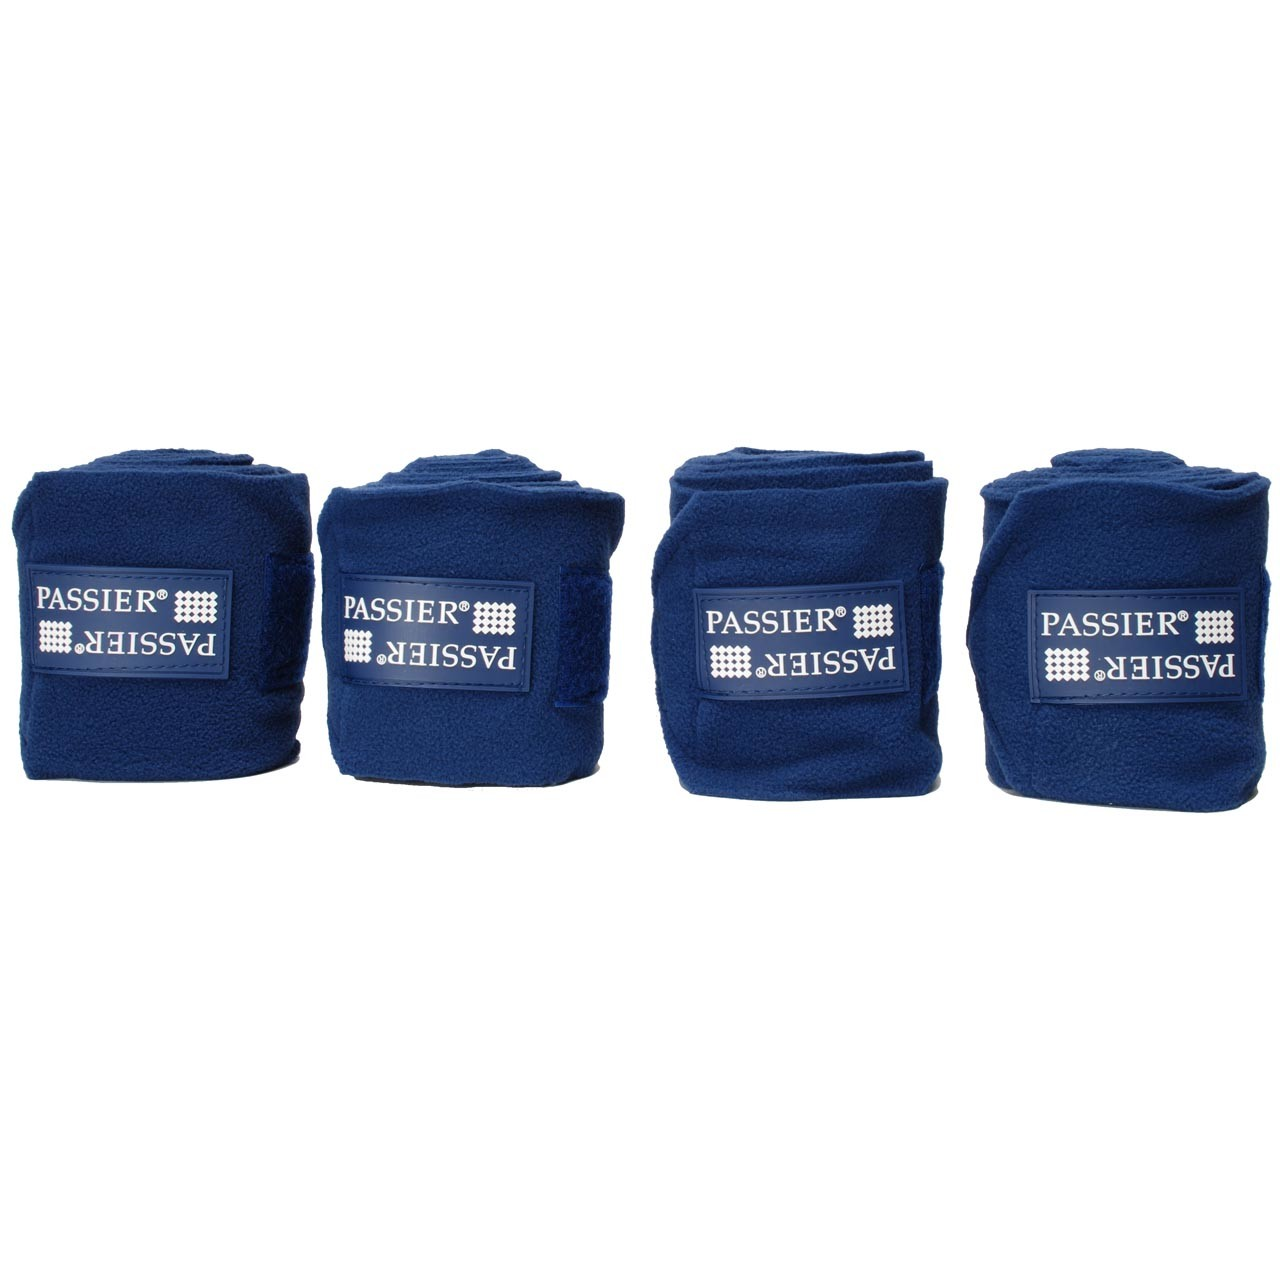 Passier fleece bandages donkerblauw maat:full